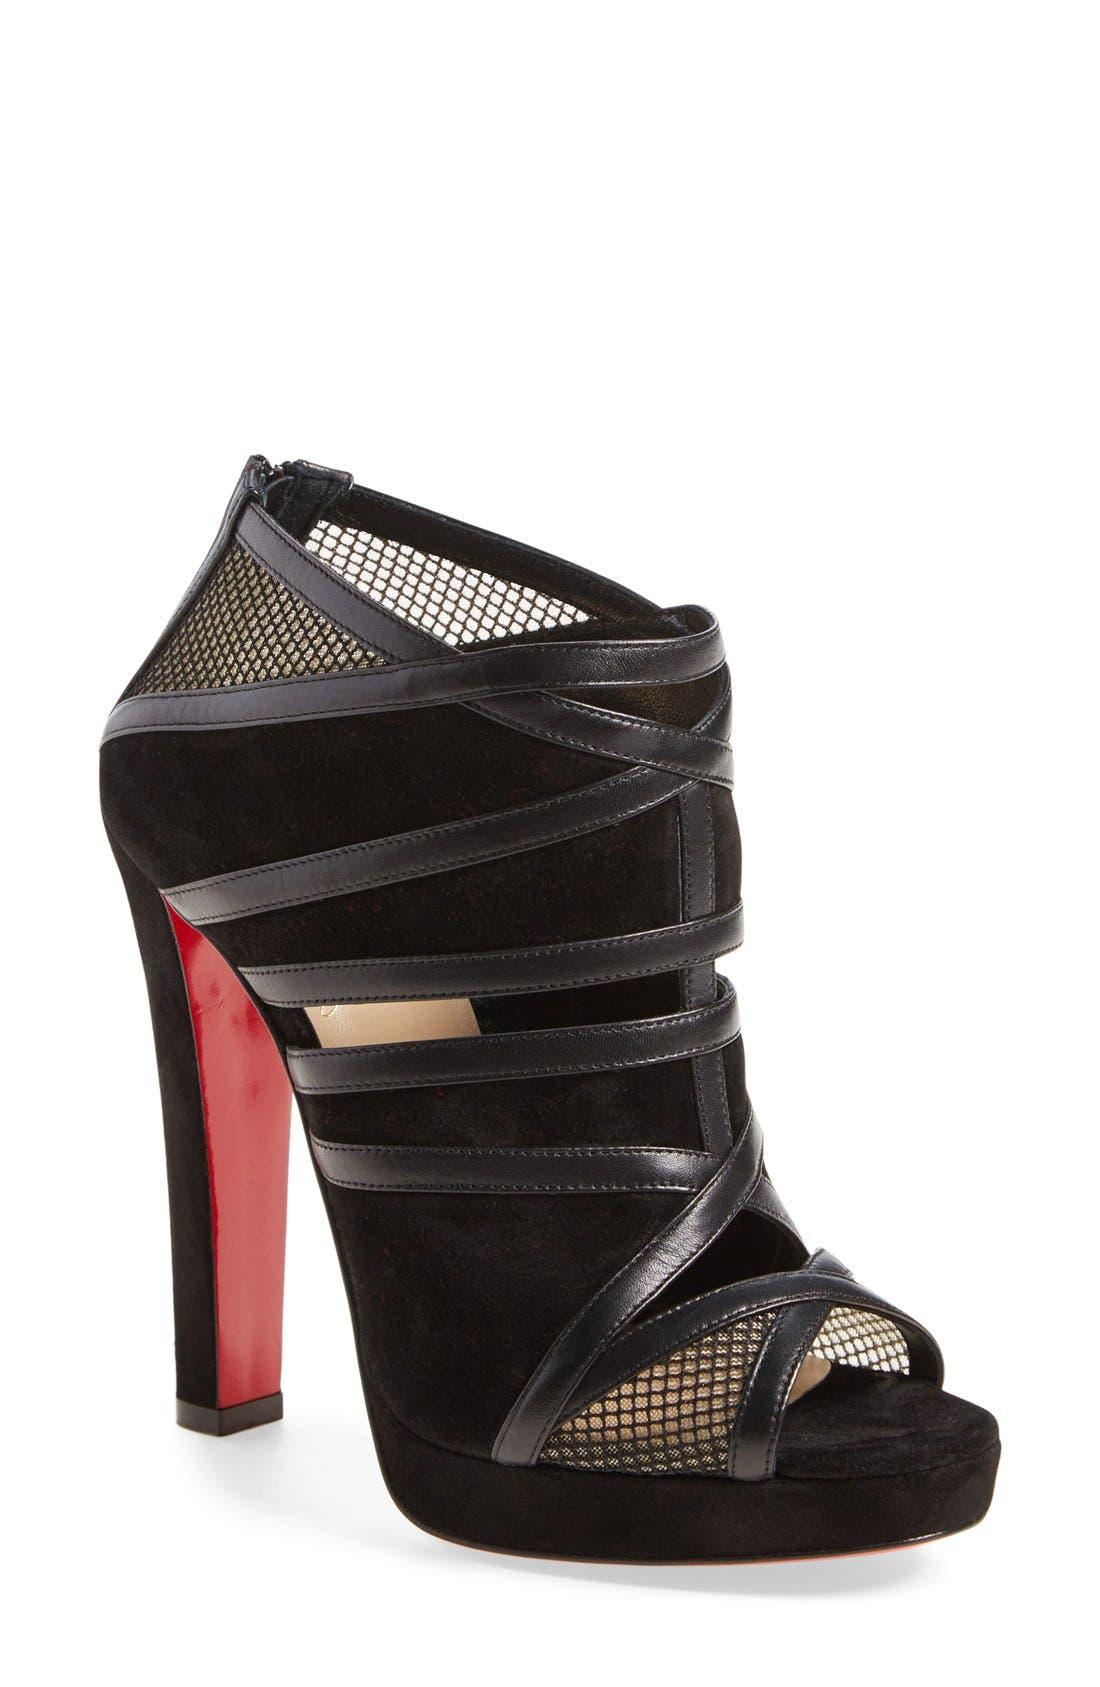 Main Image - Christian Louboutin 'Cammandanta' Open Toe Platform Sandal